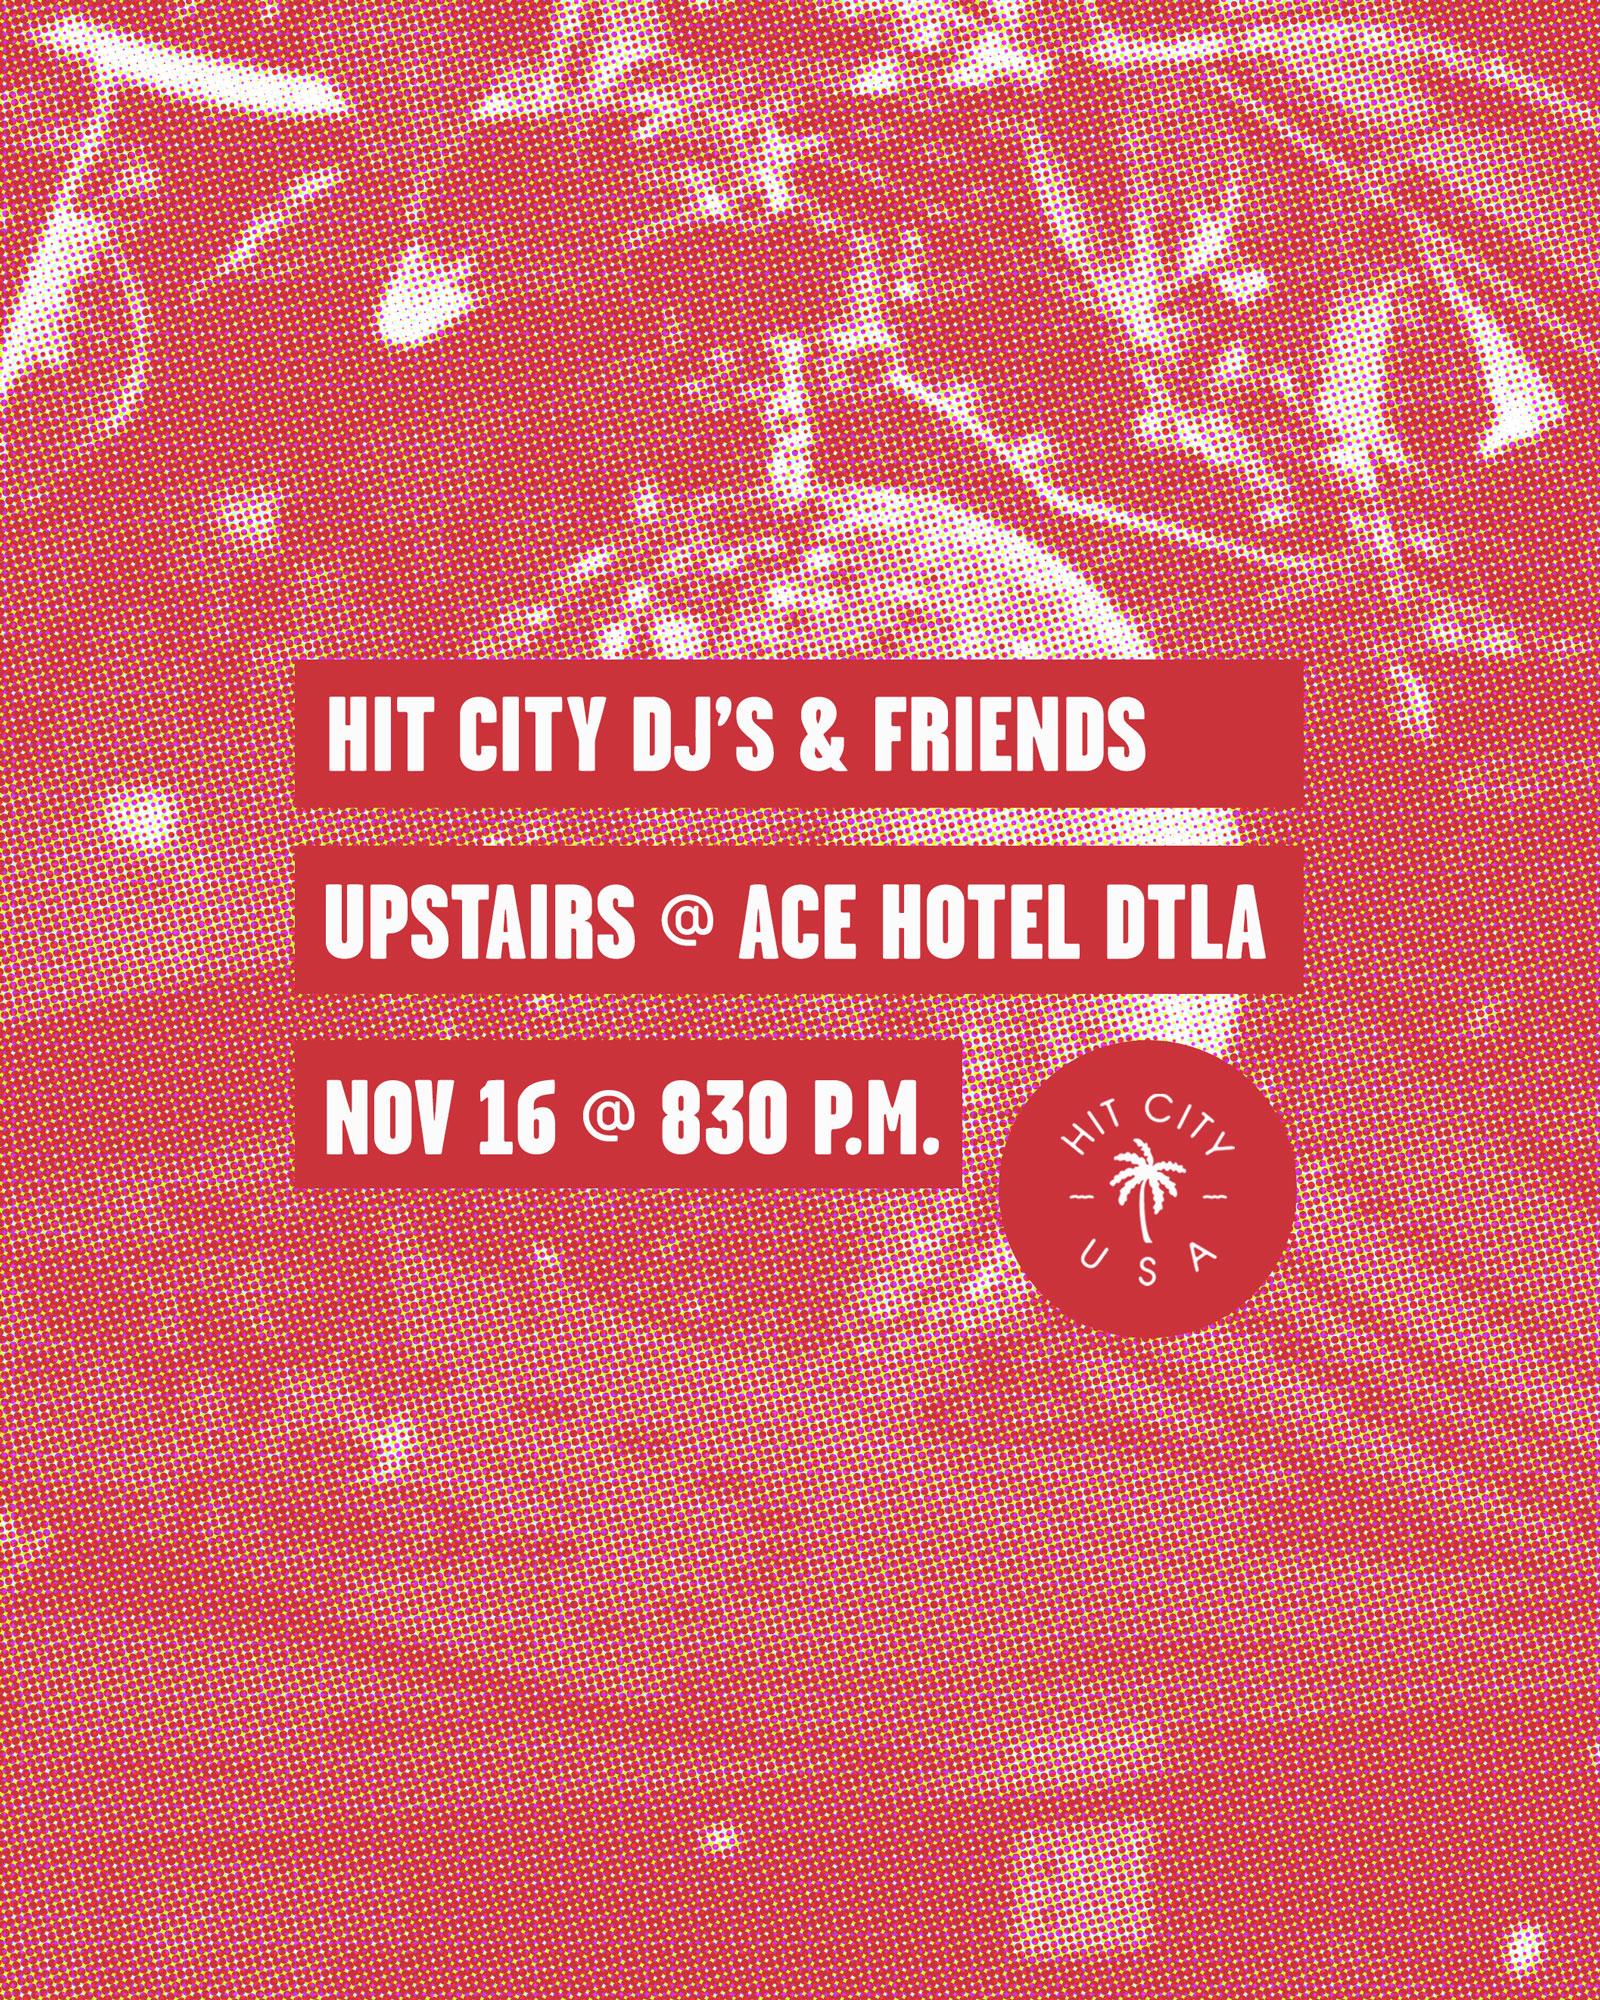 Hit Cit DJ's & Friends Upstairs at Ace Hotel DTLA